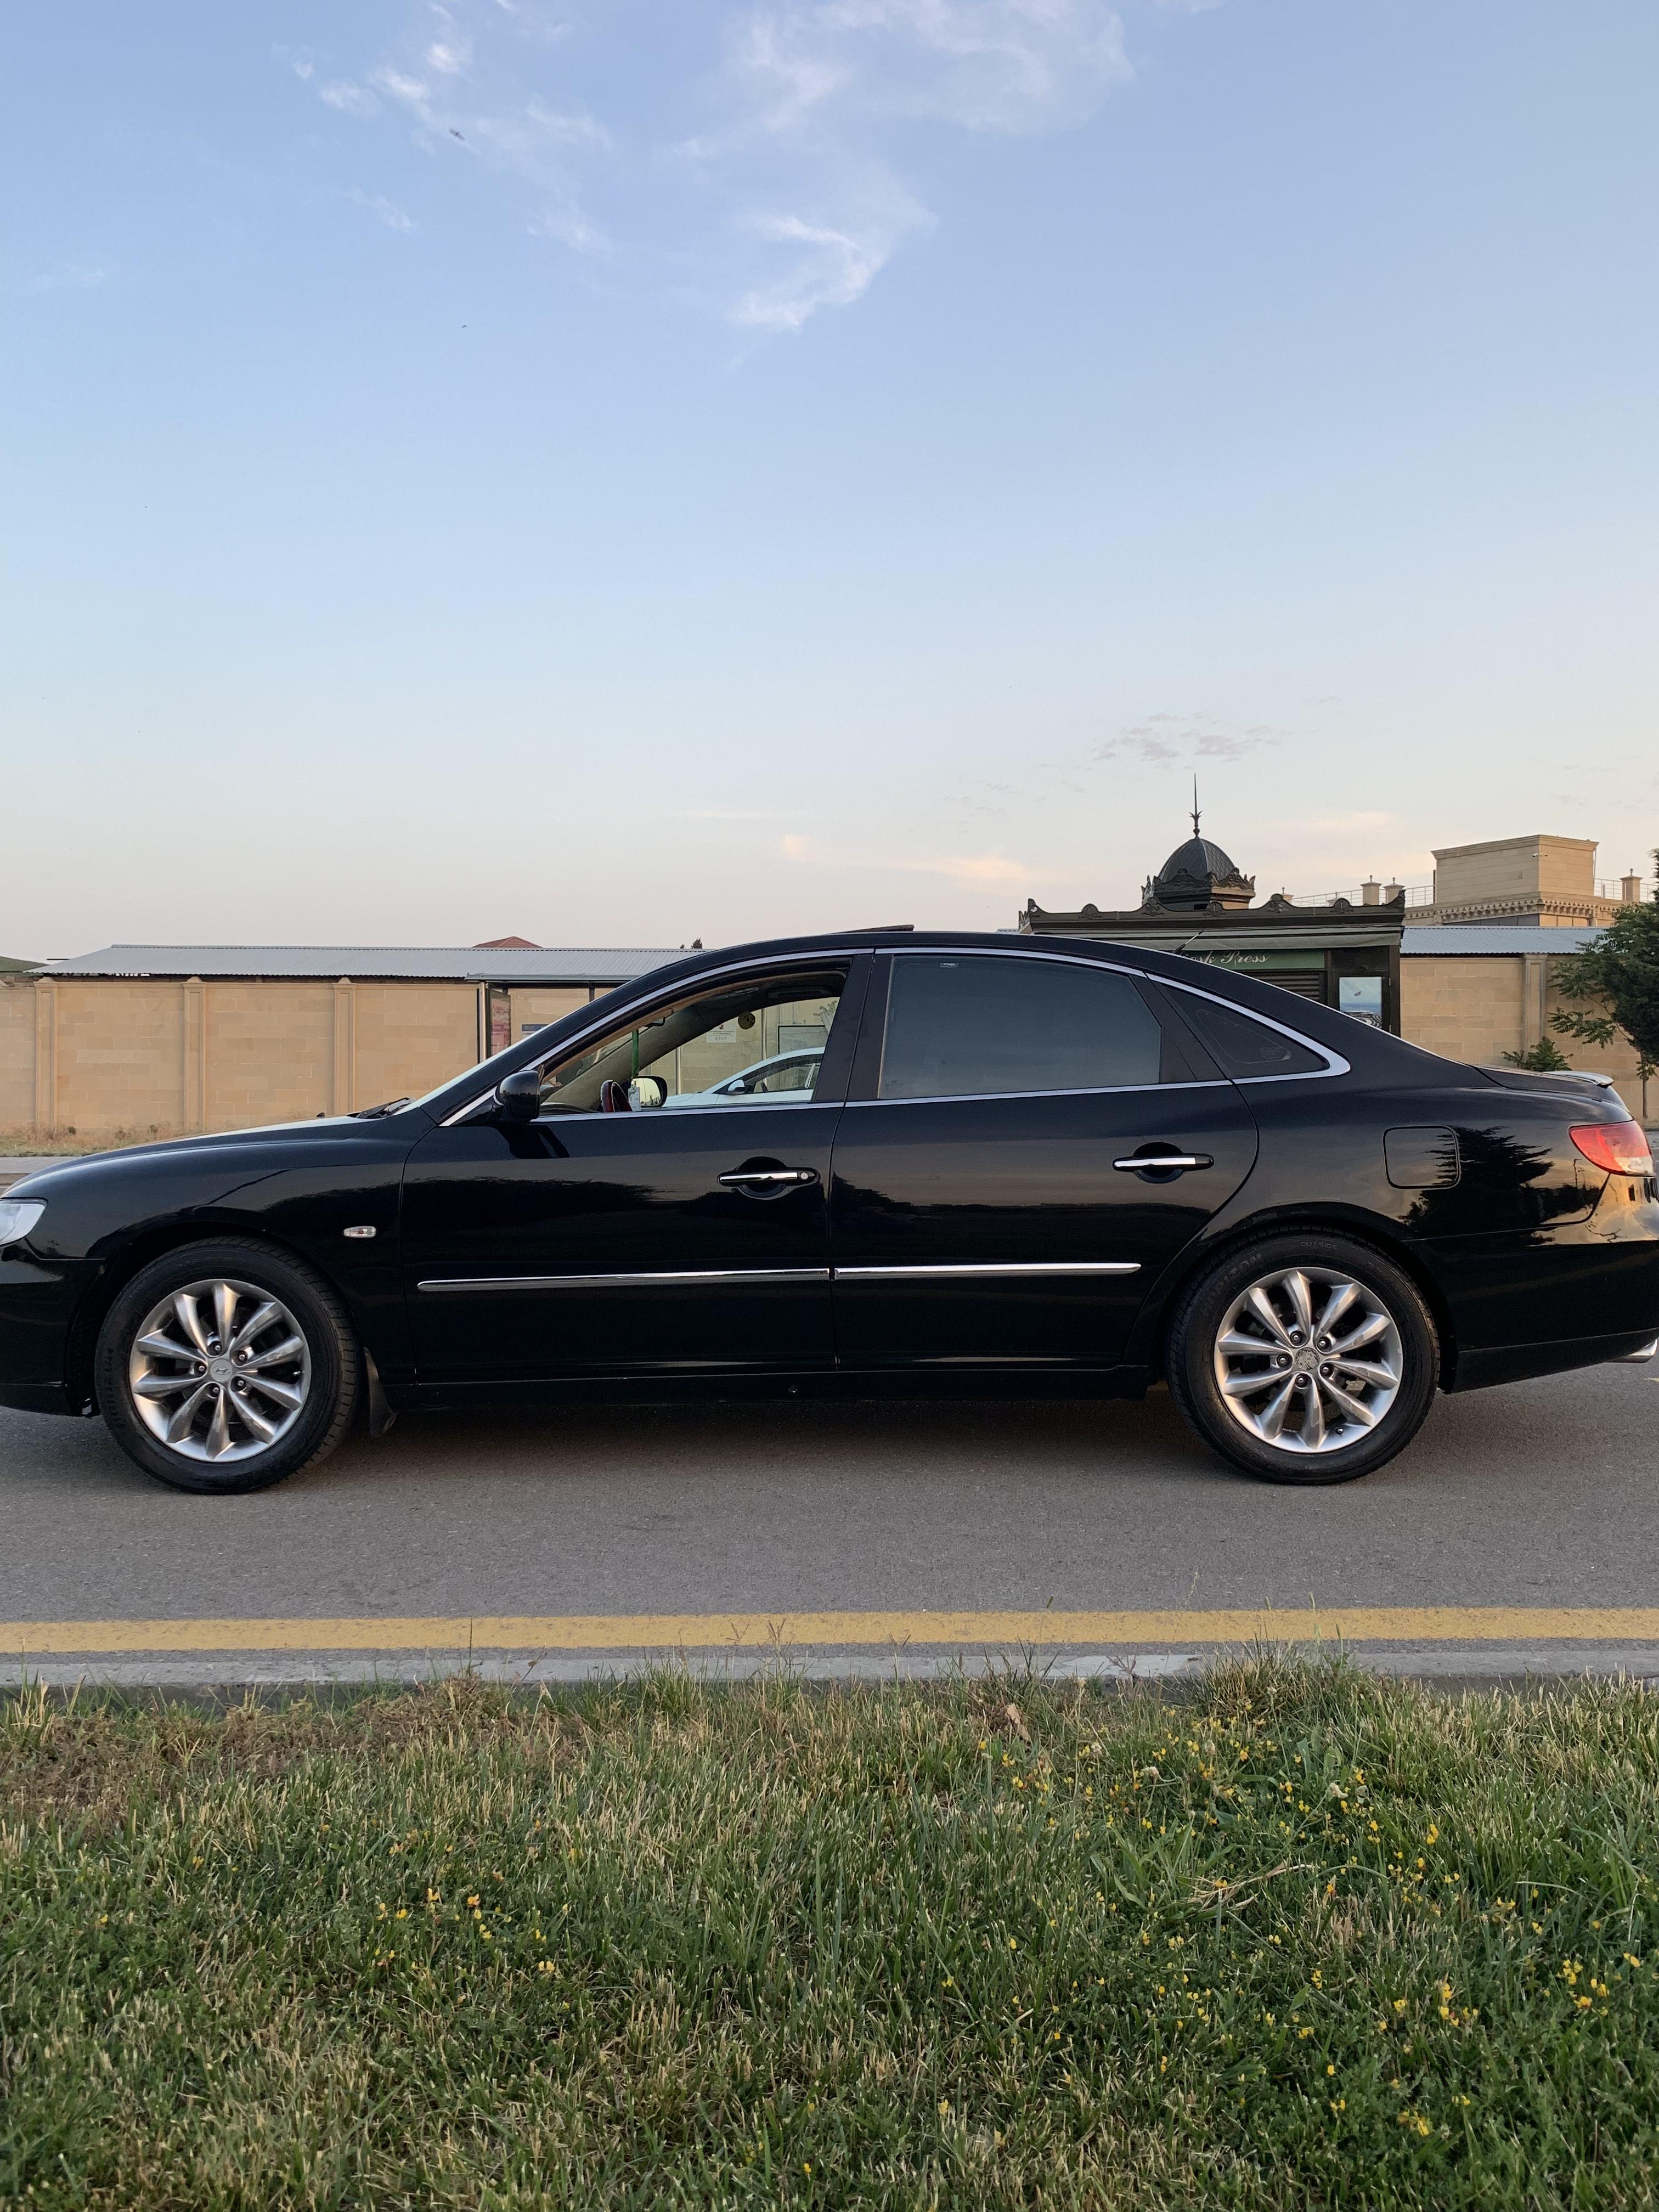 Hyundai Grandeur/Azera 3.3(lt) 2006 İkinci əl  $13200